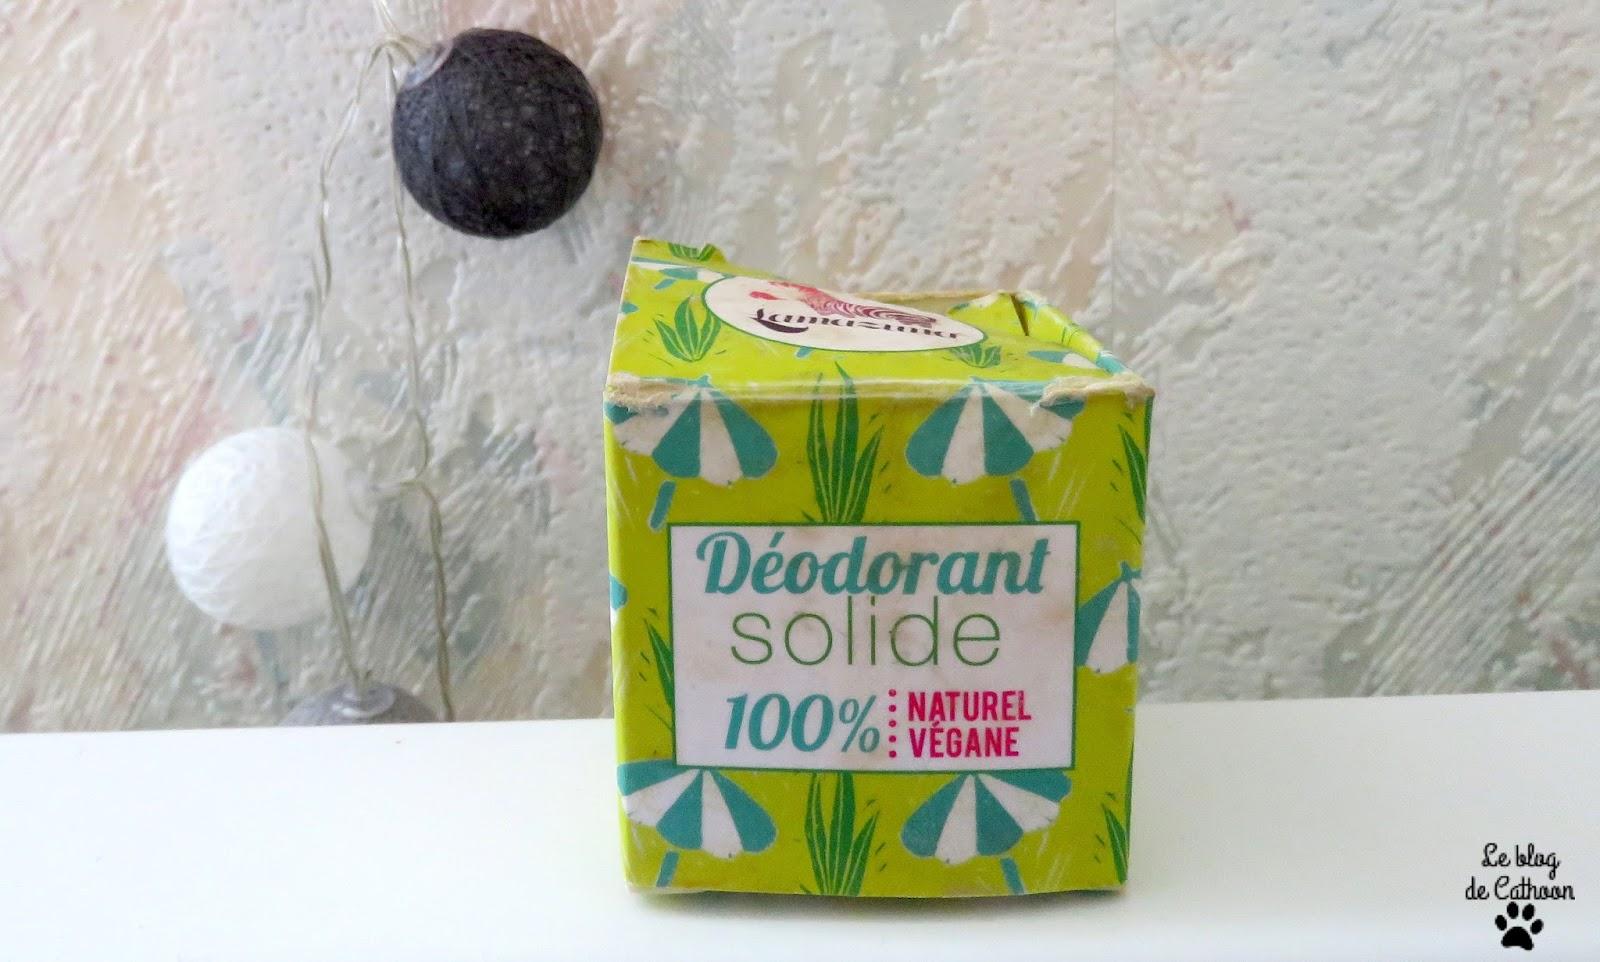 Déodorant Solide 100% Naturel Végane - Lamazuna